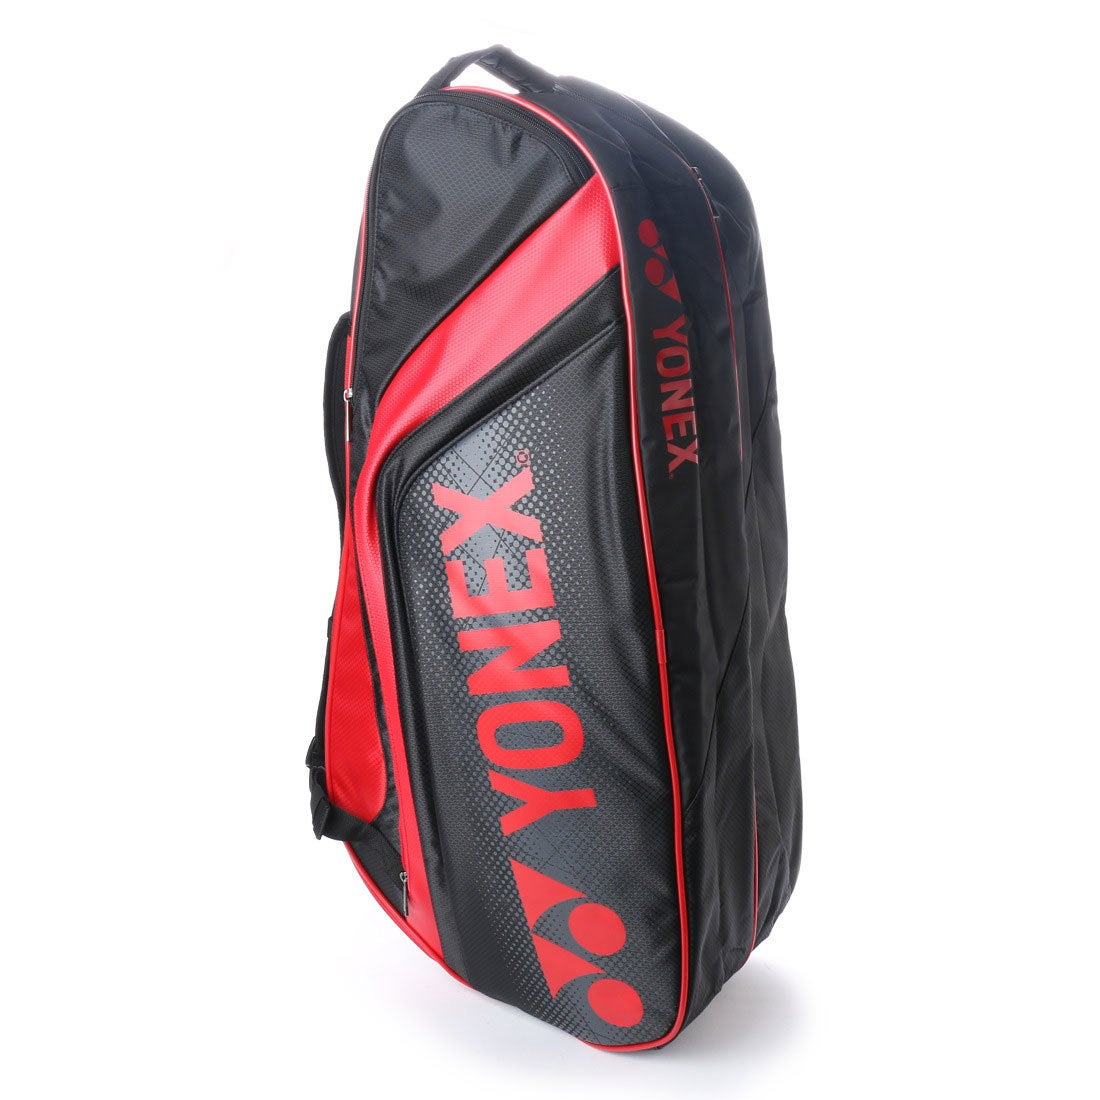 【SALE 10%OFF】ヨネックス YONEX ユニセックス テニス ラケットバック6(リュック付)〈テニス6本用〉 BAG1812R